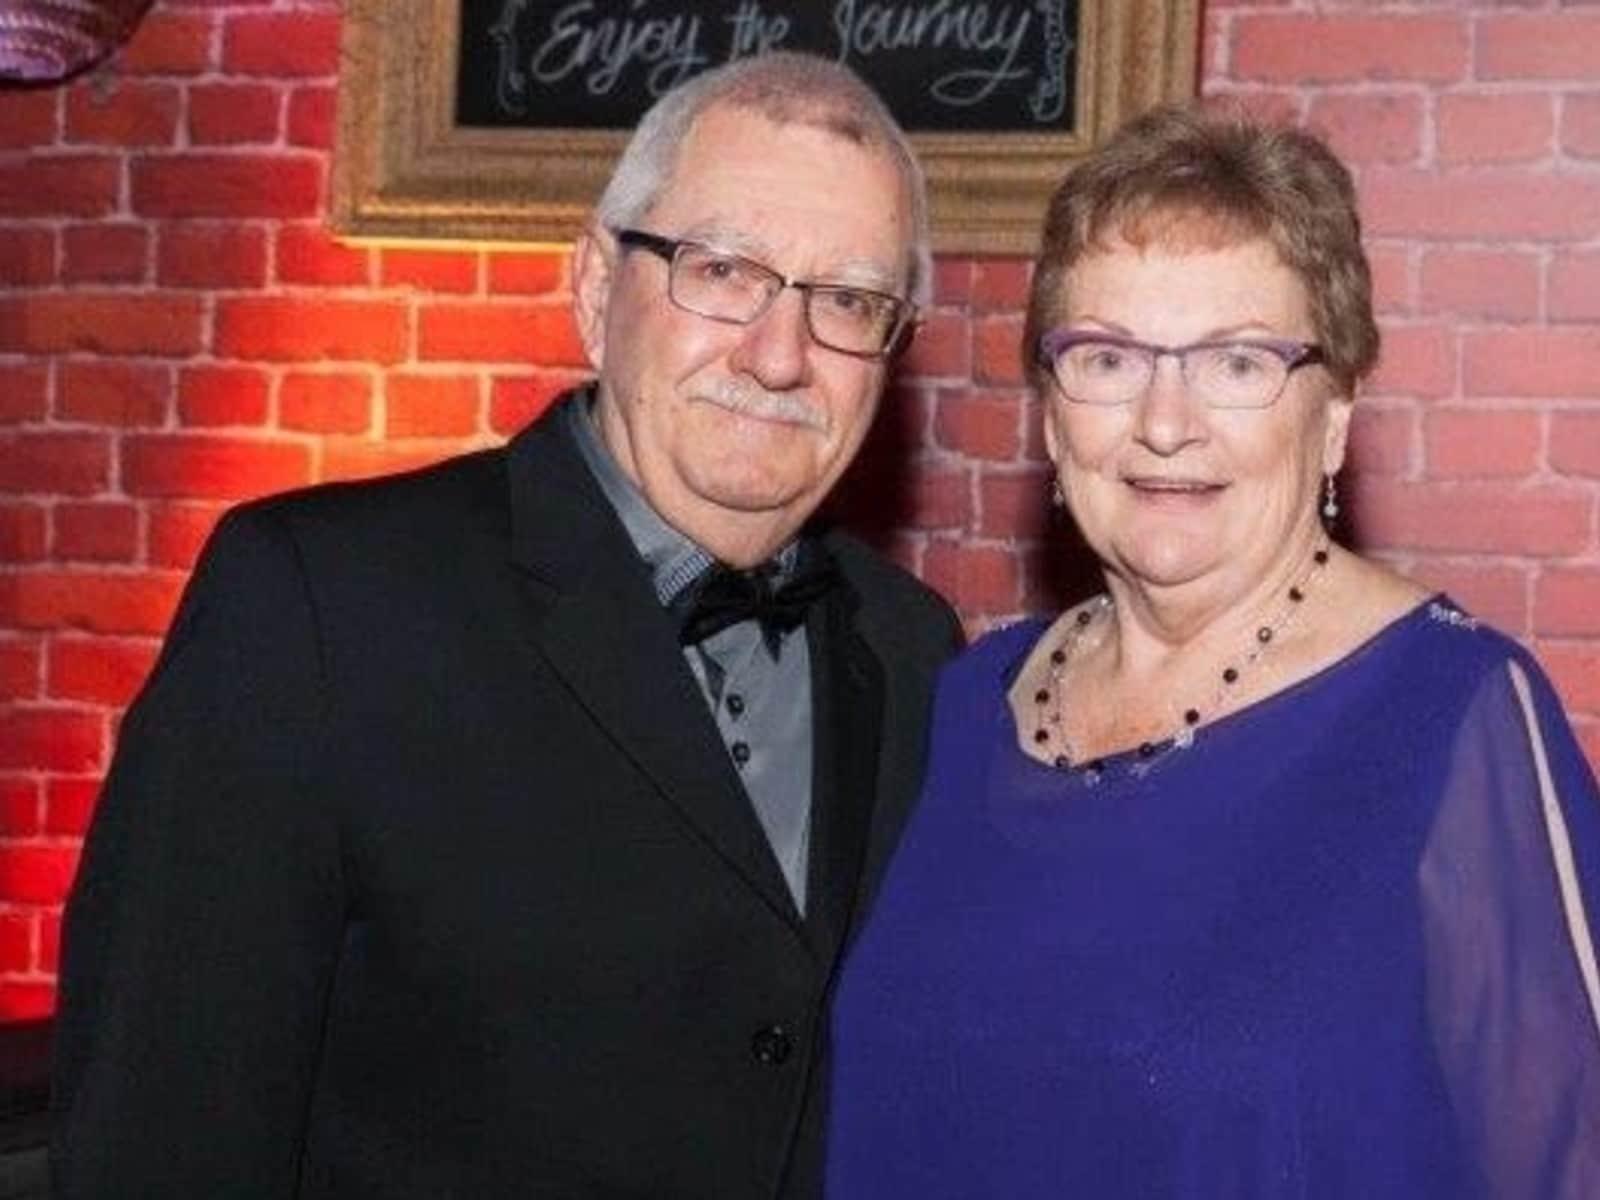 Margaret & Gregory from Dublin, Ireland